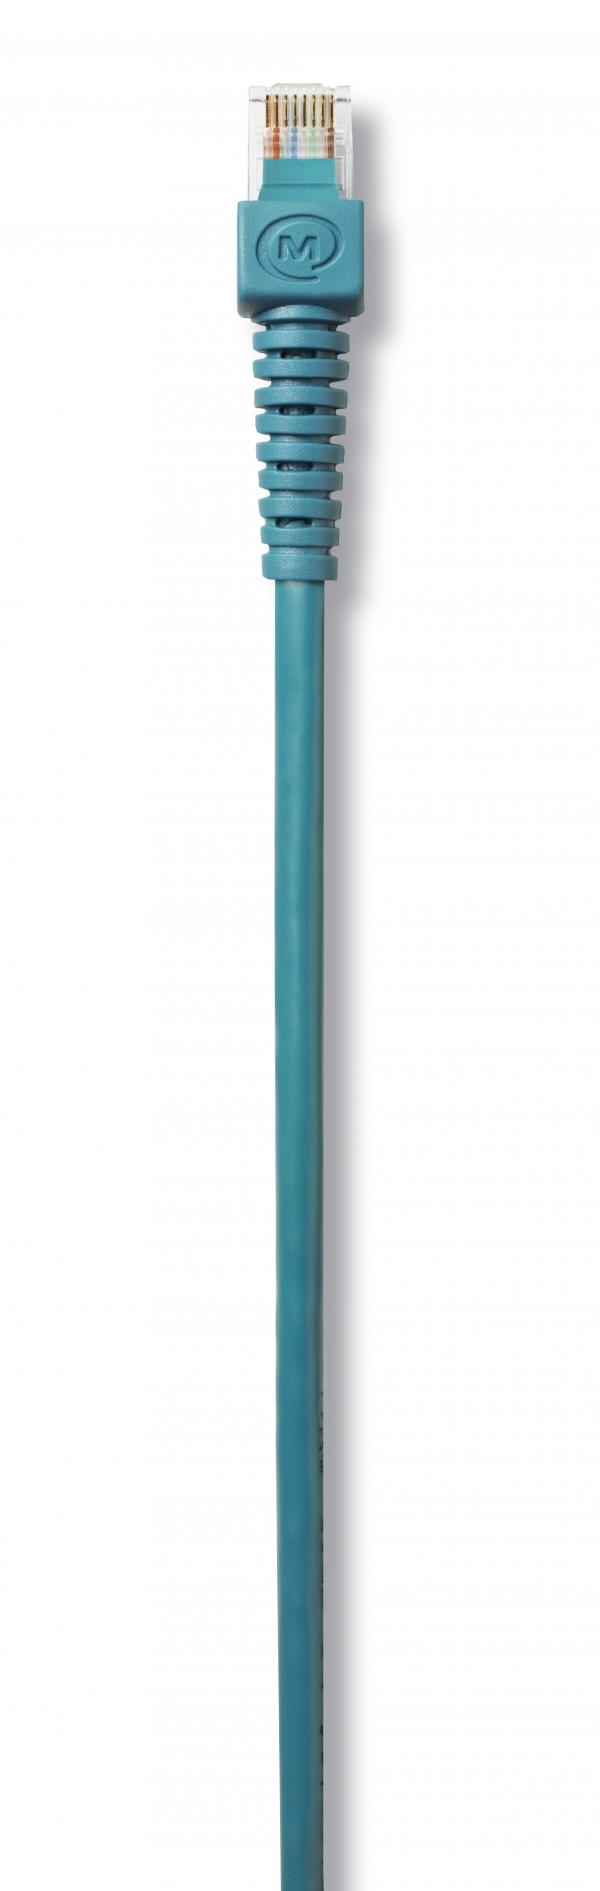 Câble MasterBus, 1 mètre